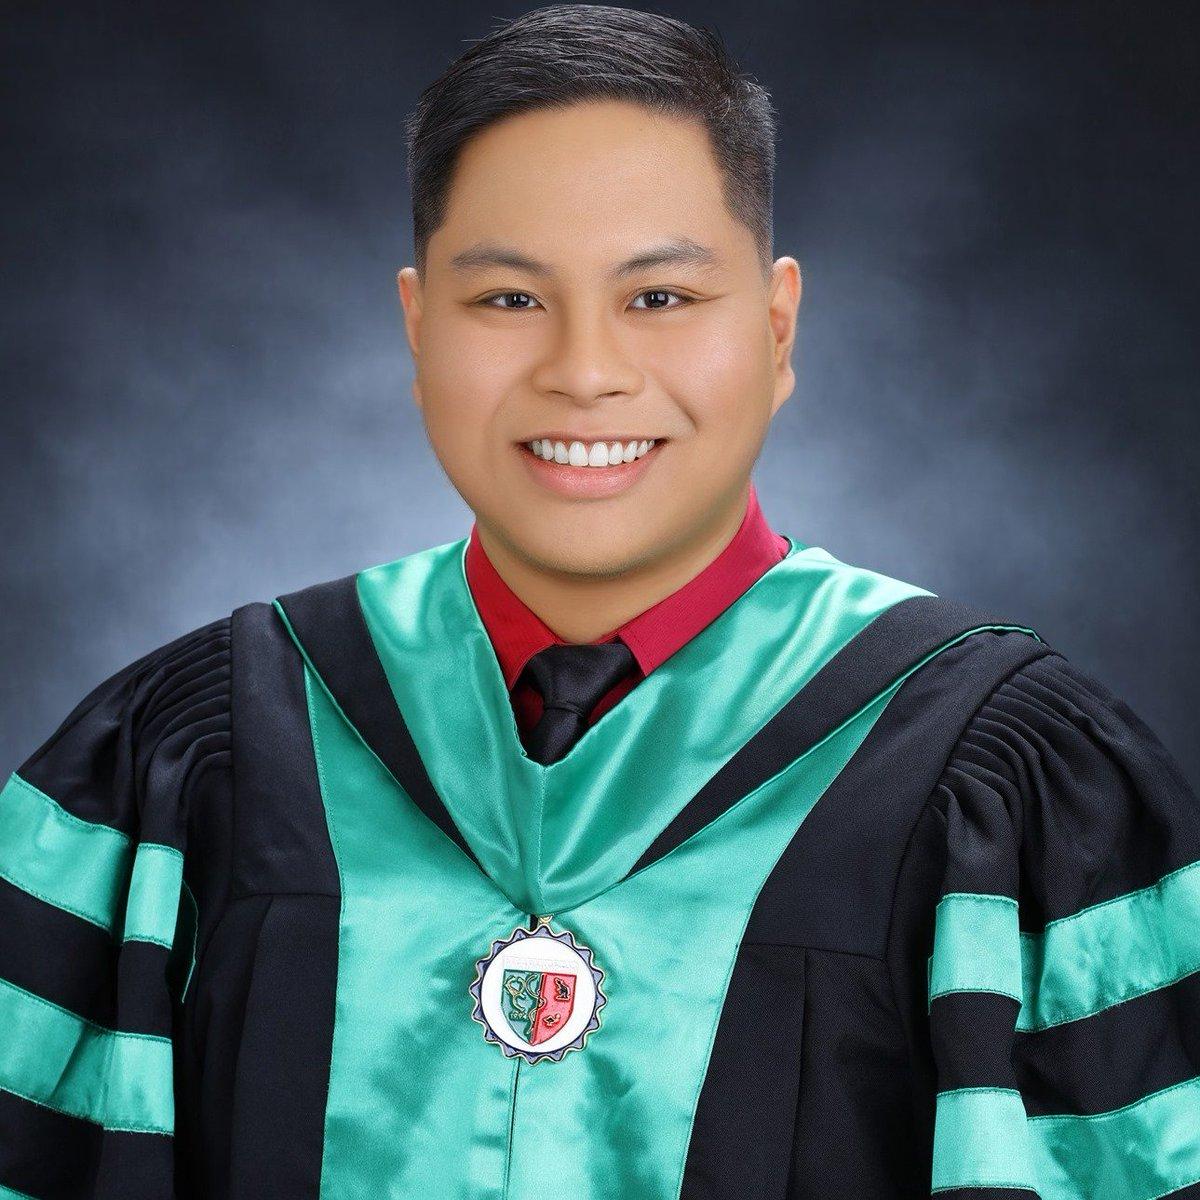 ENGR. KEVIN RACADIO BASIS, M.D.Doctor of MedicineSt. Luke's Medical Center College of Medicine - William H. Quasha MemorialClass of 2019